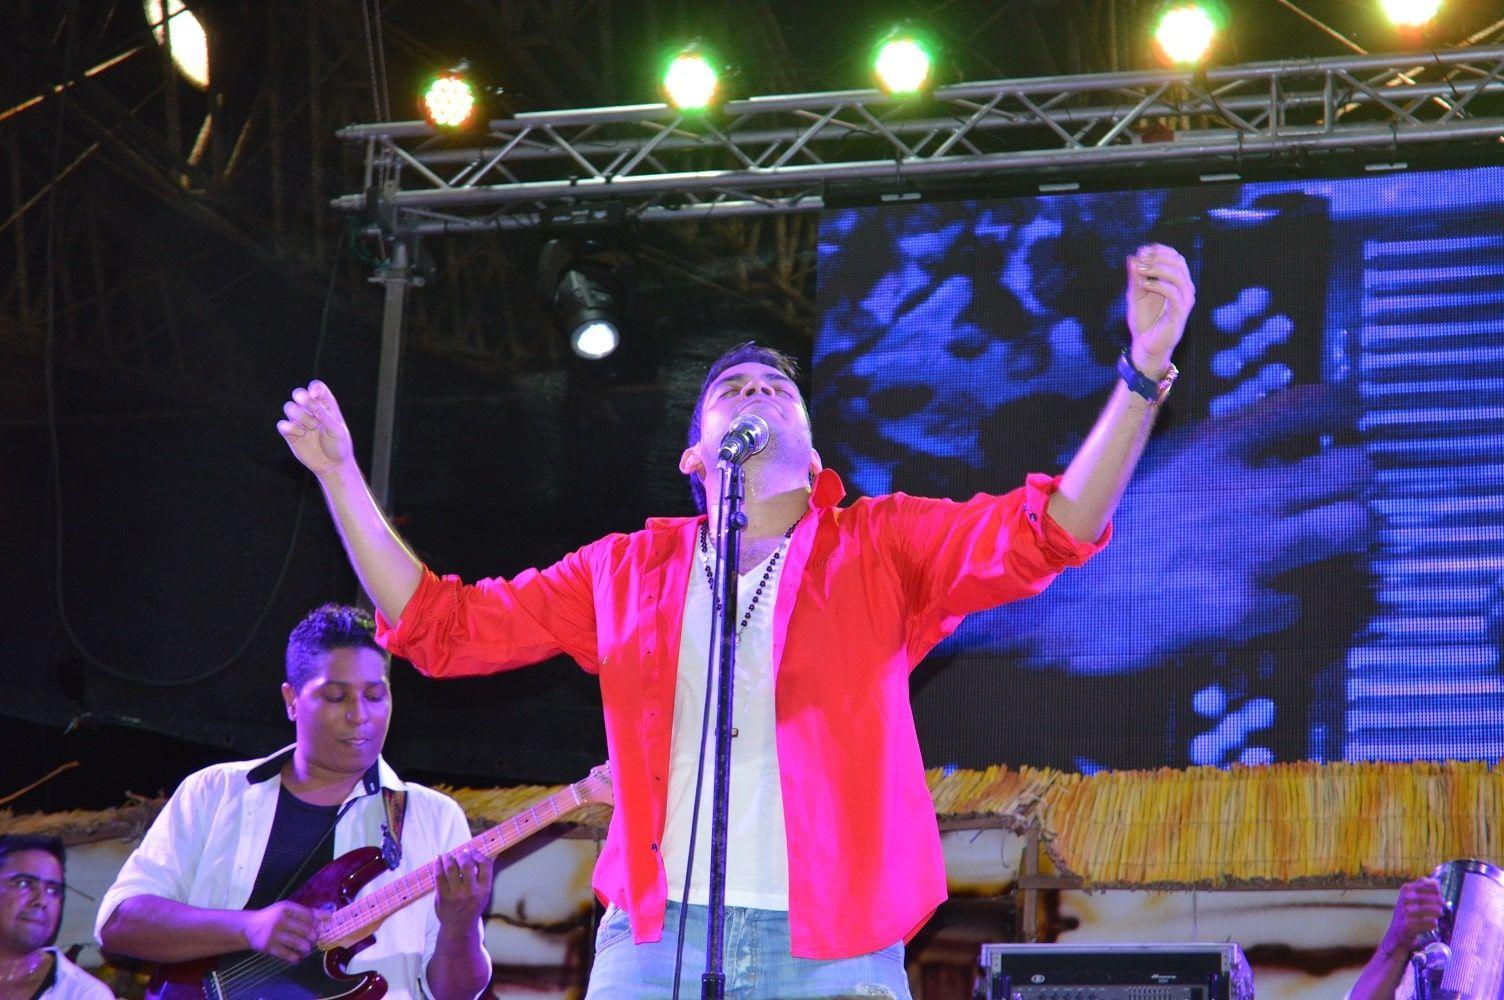 Elkin Uribe y Poncho Monsalvo